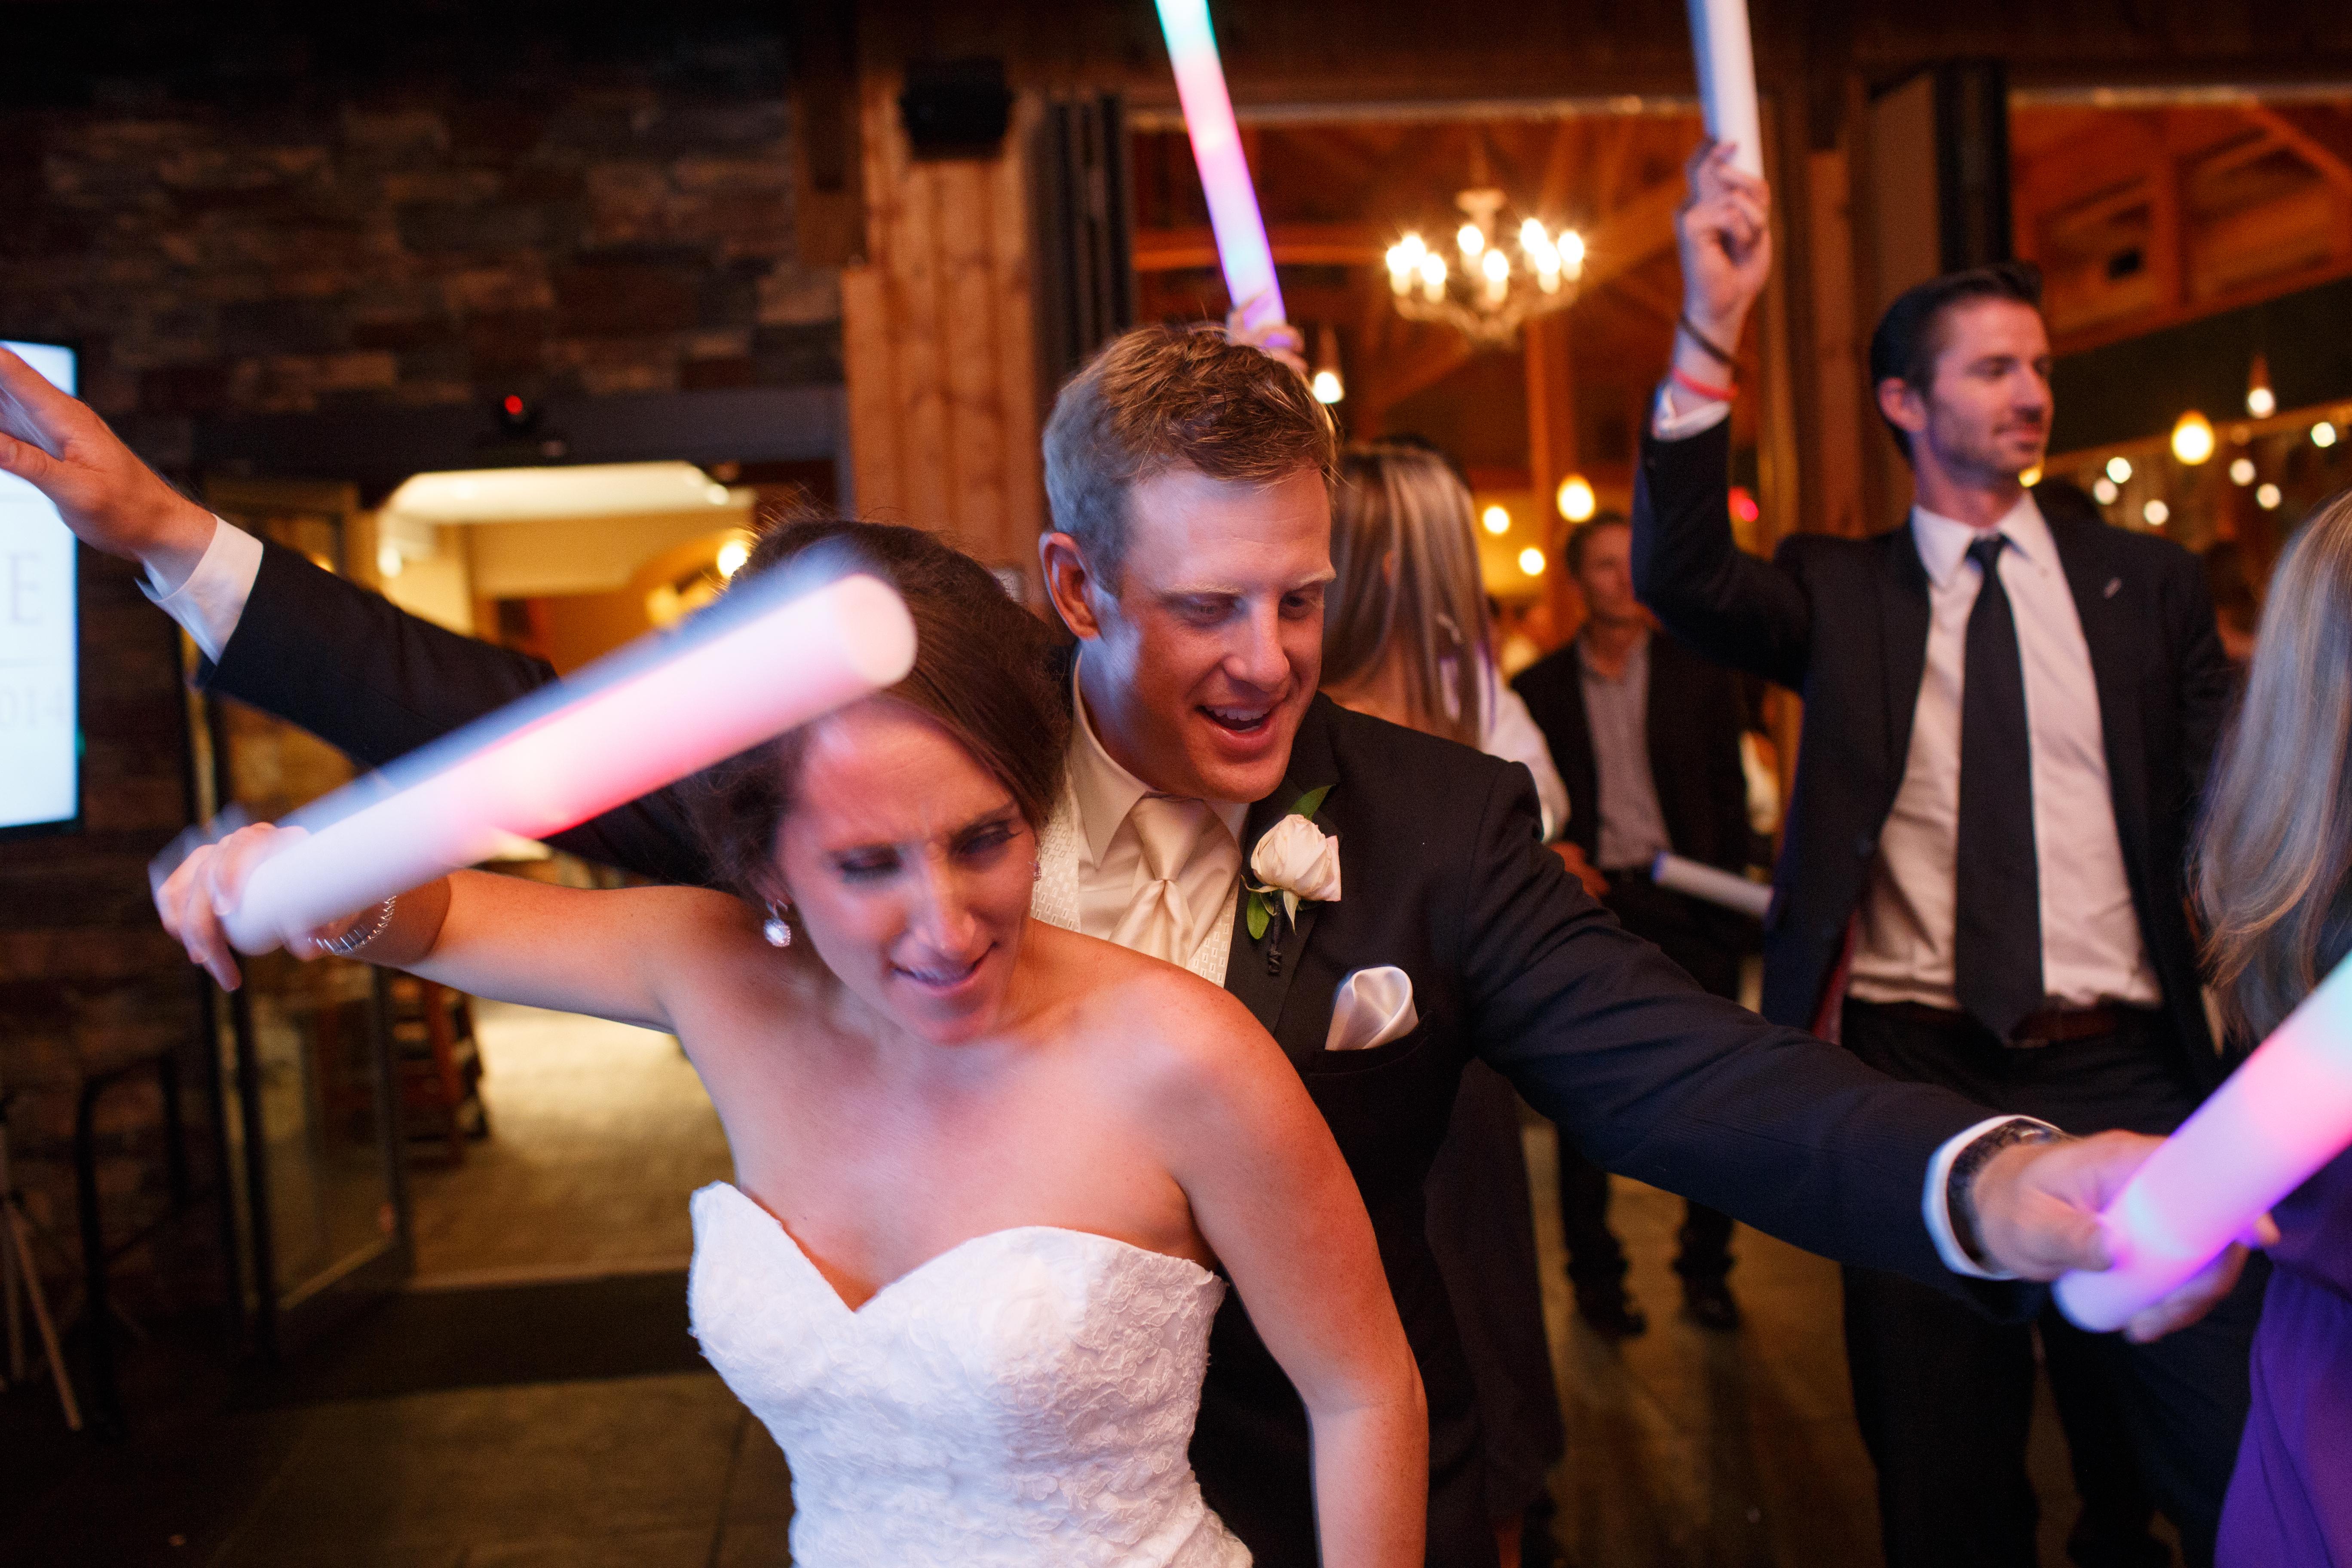 Our 4 Year Wedding Anniversary - Wedding - Anniversary Post - Communikait by Kait Hanson #wedding #pinkandcreamwedding #summerwedding